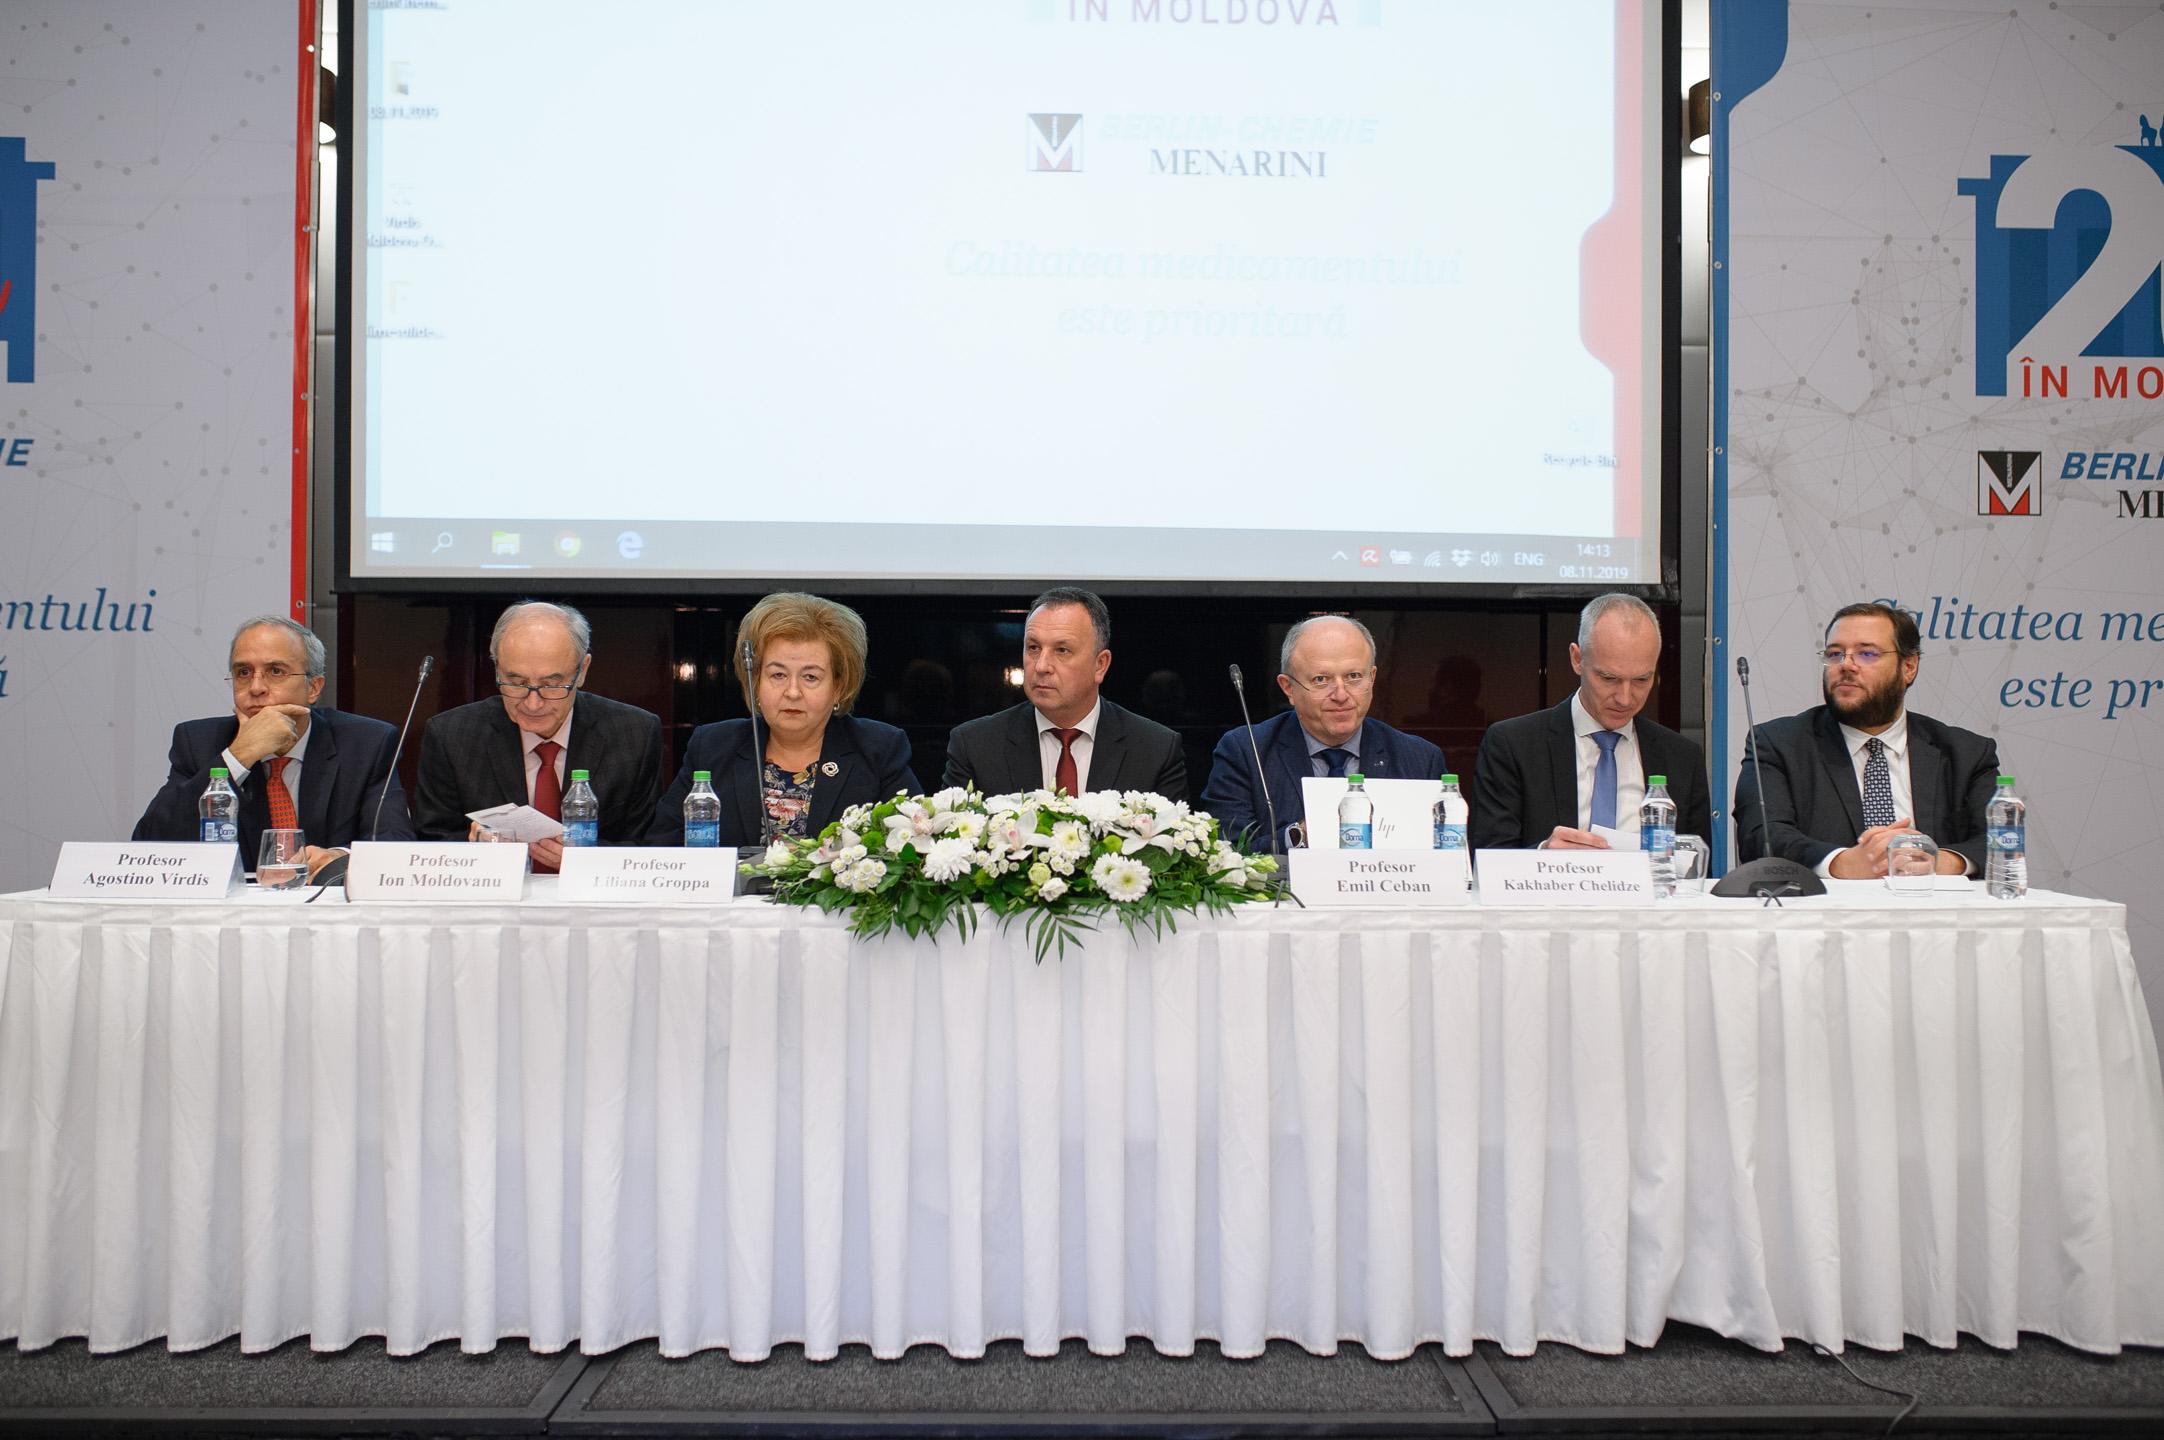 Berlin-Chemie/Menarini - 20 лет деятельности в Молдове